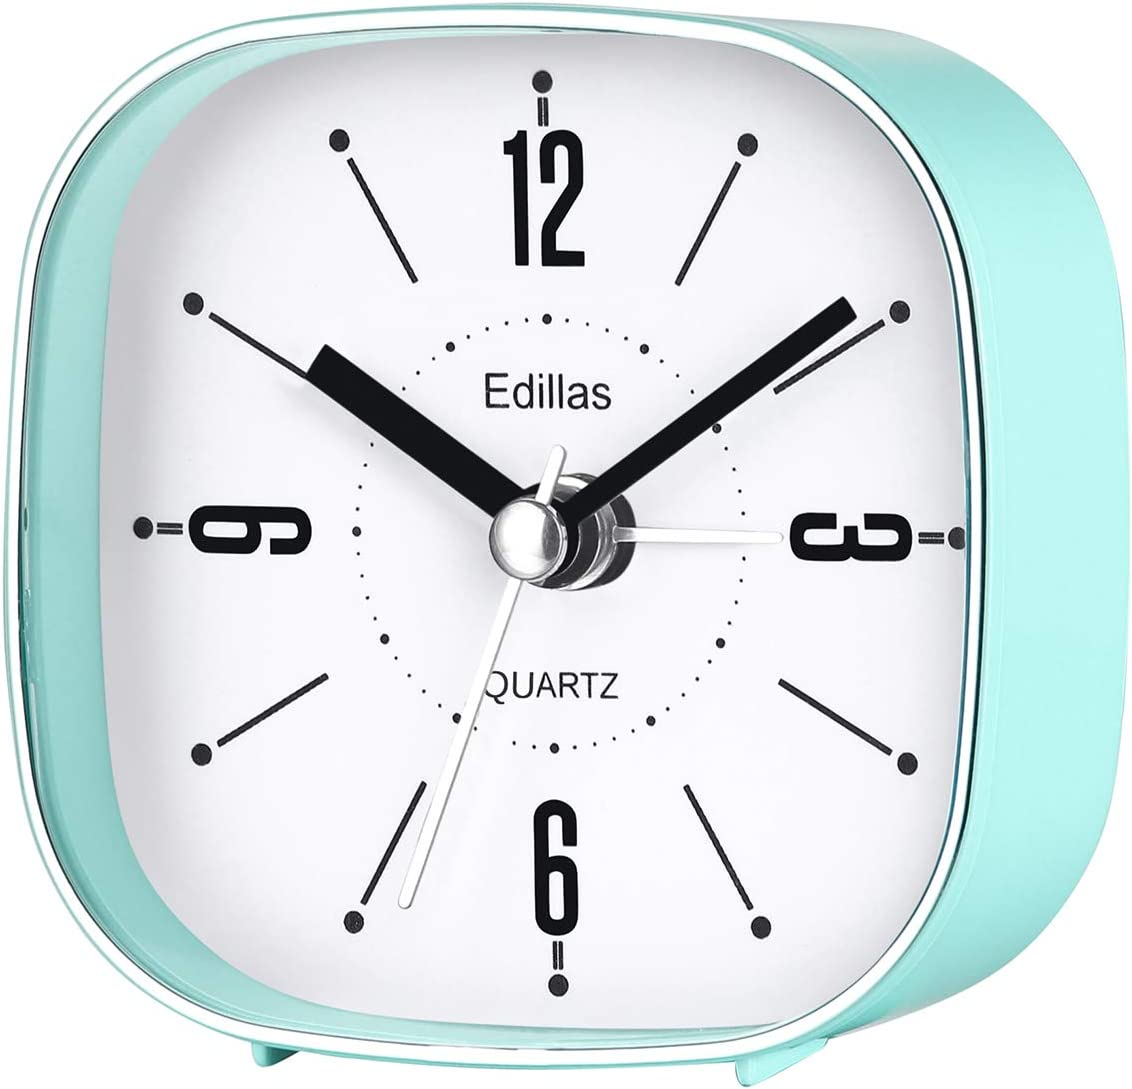 Small Analog Alarm Clocks 3 Travel Inch Portable Finally Jacksonville Mall resale start Simple Stylish